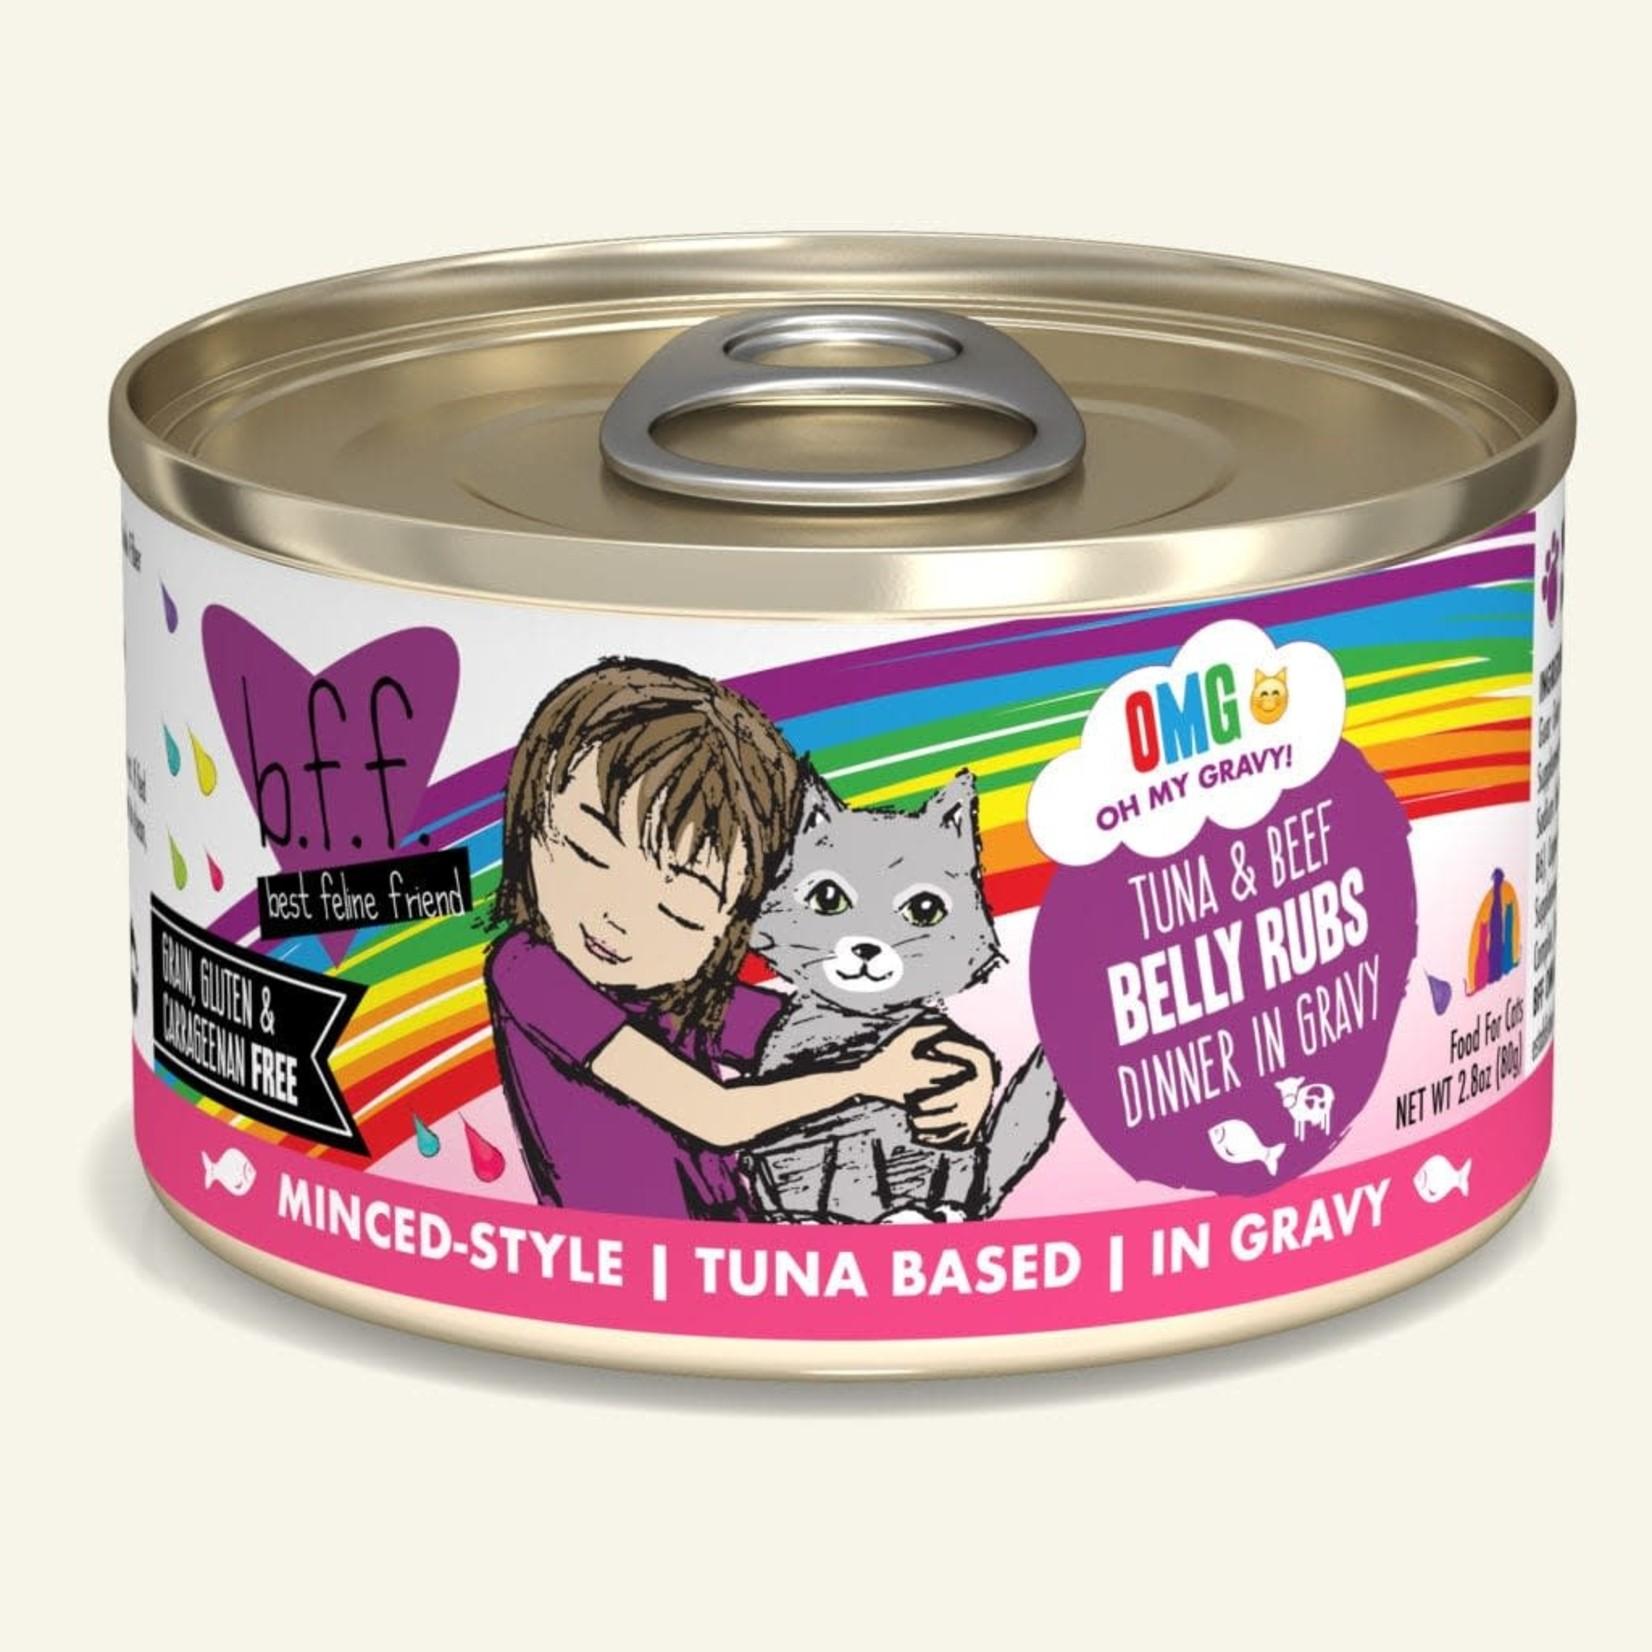 Weruva Inc. BFF OMG Cat Tuna & Beef Belly Rubs 2.8 OZ